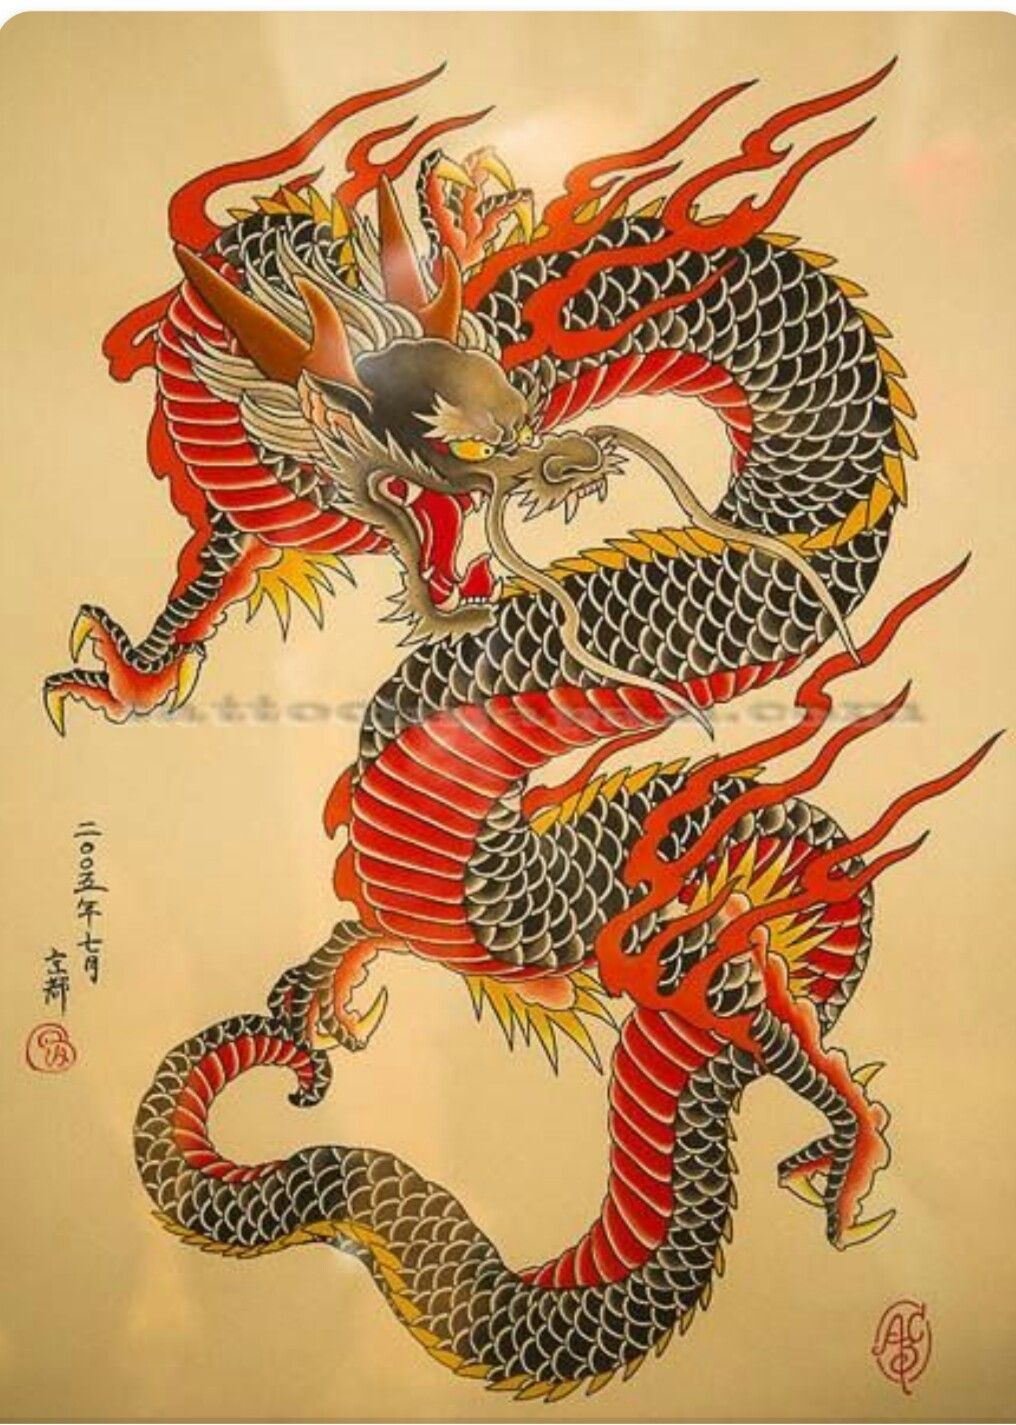 Japanese Dragon: D2f0859ed7a9ff34e097ac3eaacedeef.jpg 1,016×1,425 Pixels